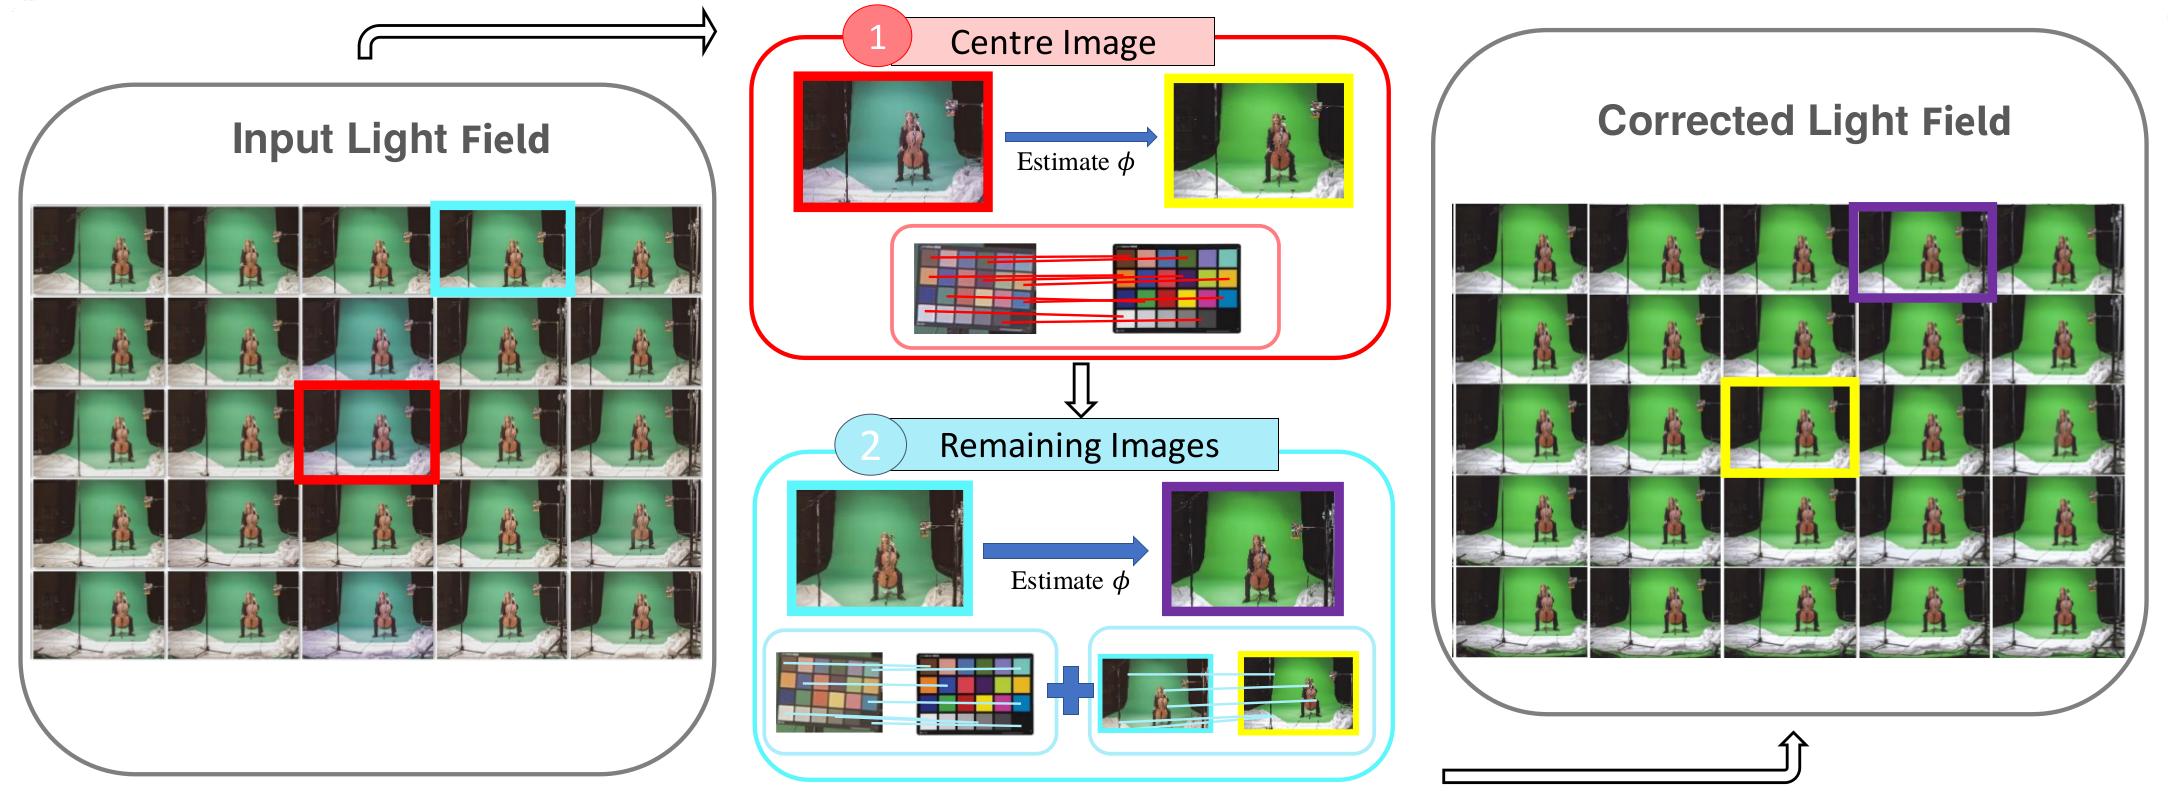 L2 based Colour Correction for Light Field Arrays